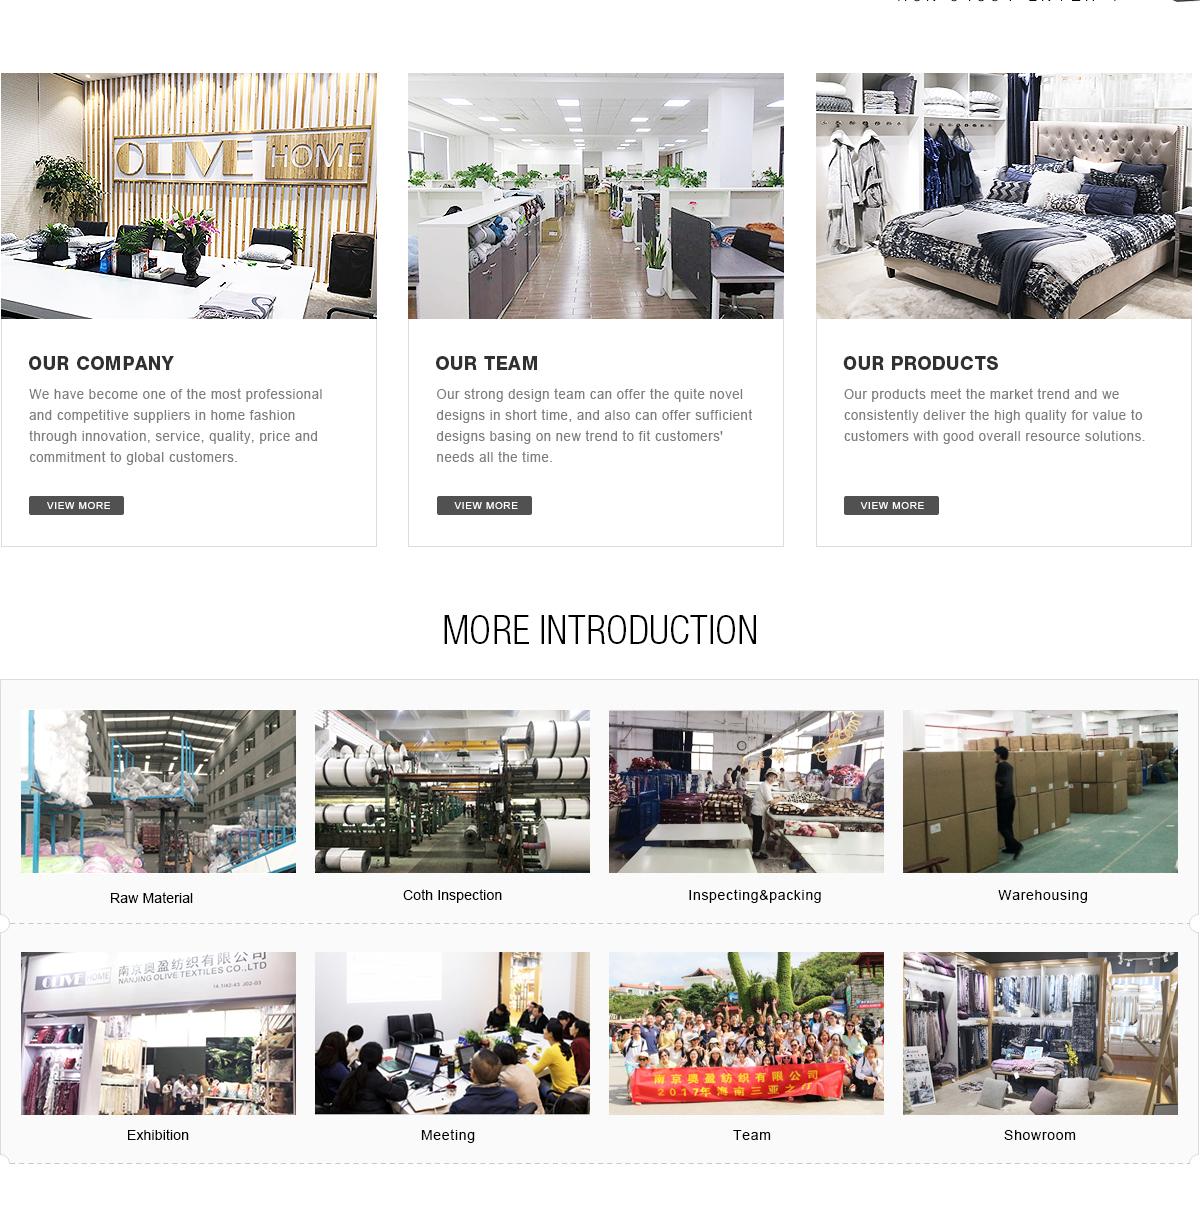 Nanjing Olive Textiles Co Ltd Home Textile Blanket